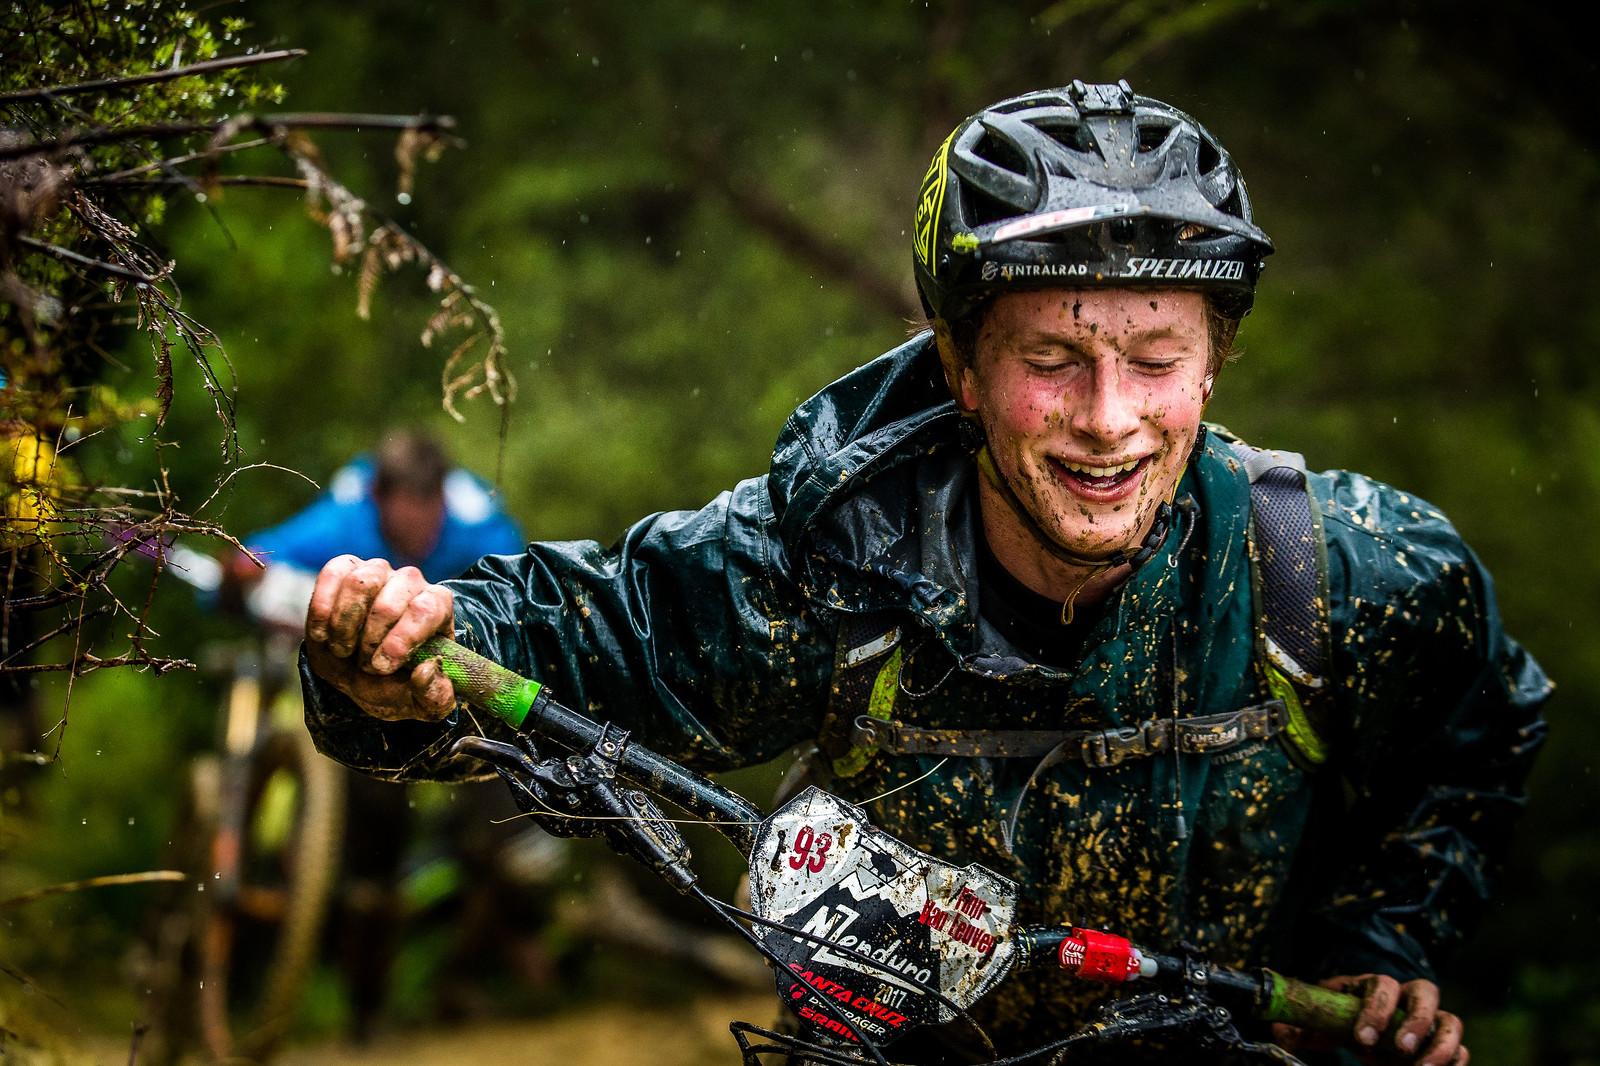 Rain and Pain But Still Smilling - NZ Enduro Day 2 - Mountain Biking Pictures - Vital MTB